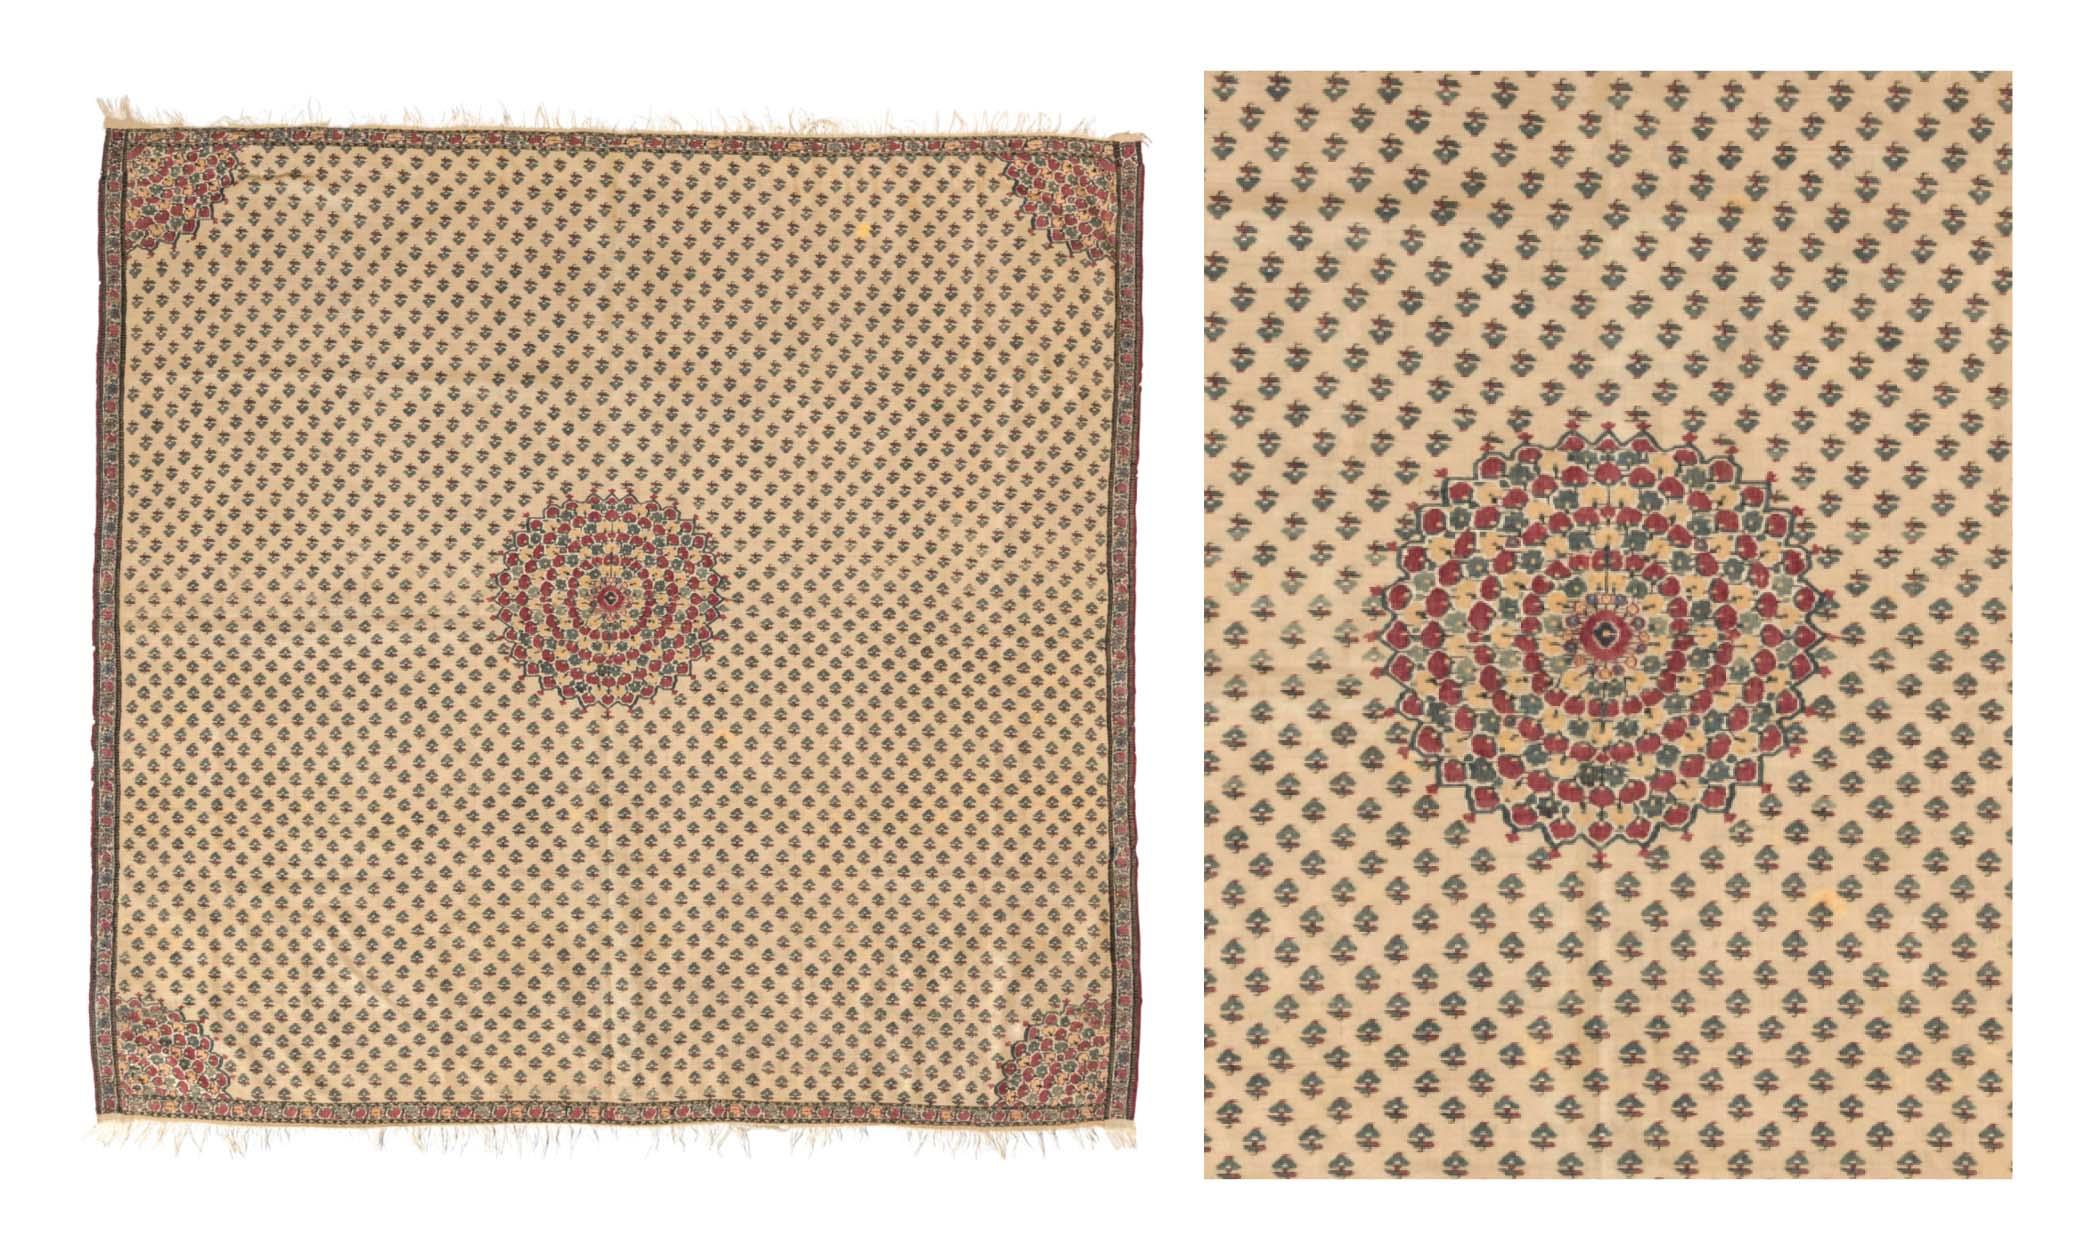 Lot 31: MOON SHAWL (CHANDAR). NORTH INDIA, LATE 18TH CENTURY.